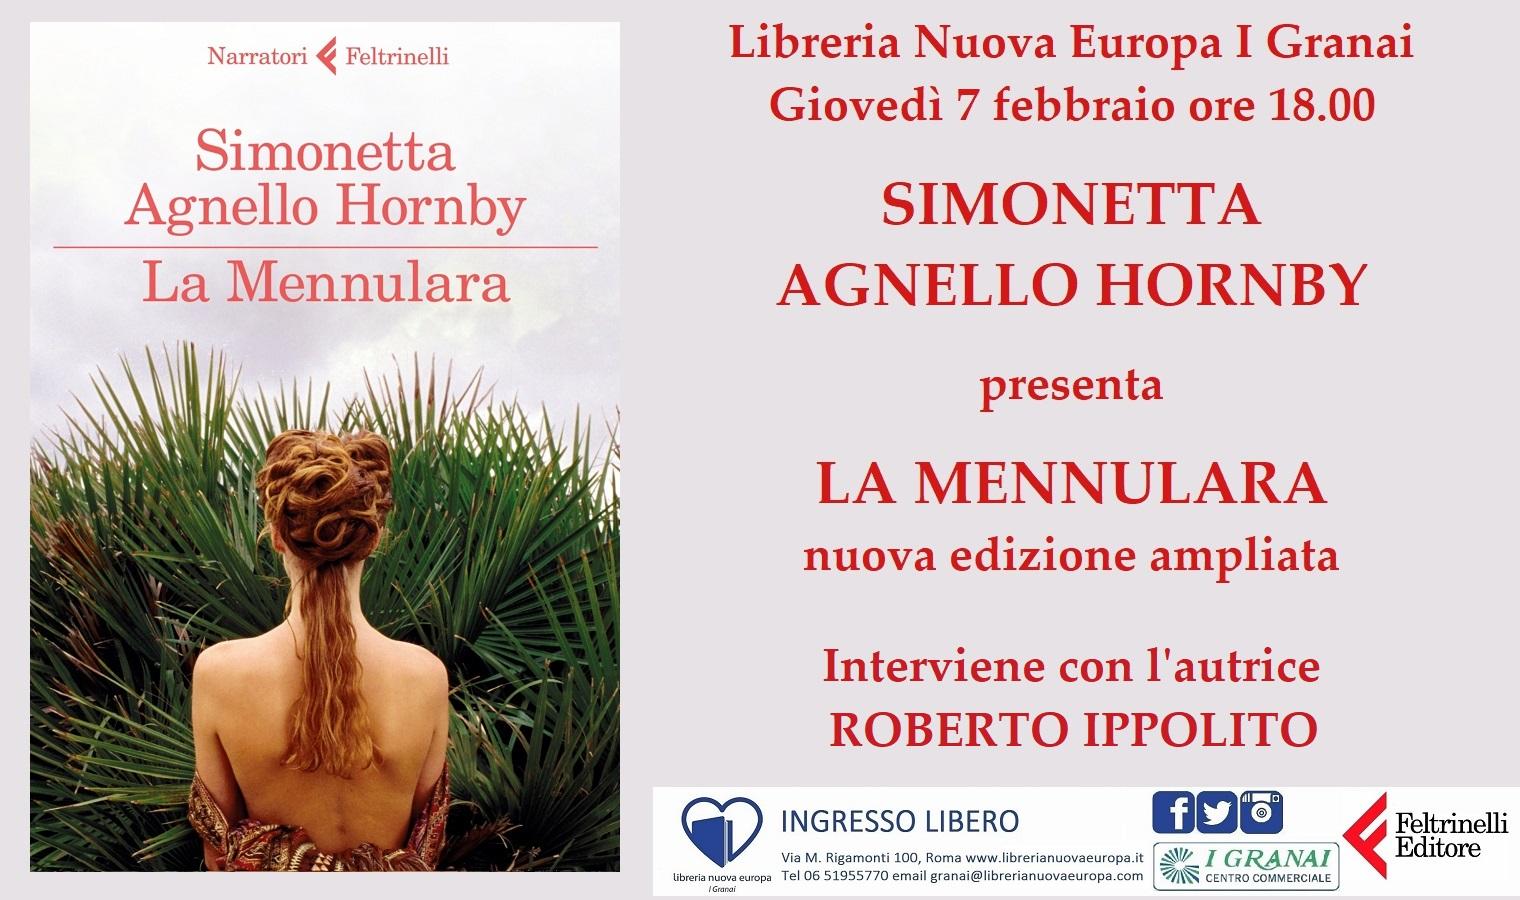 Simonetta Agnello Hornby presenta